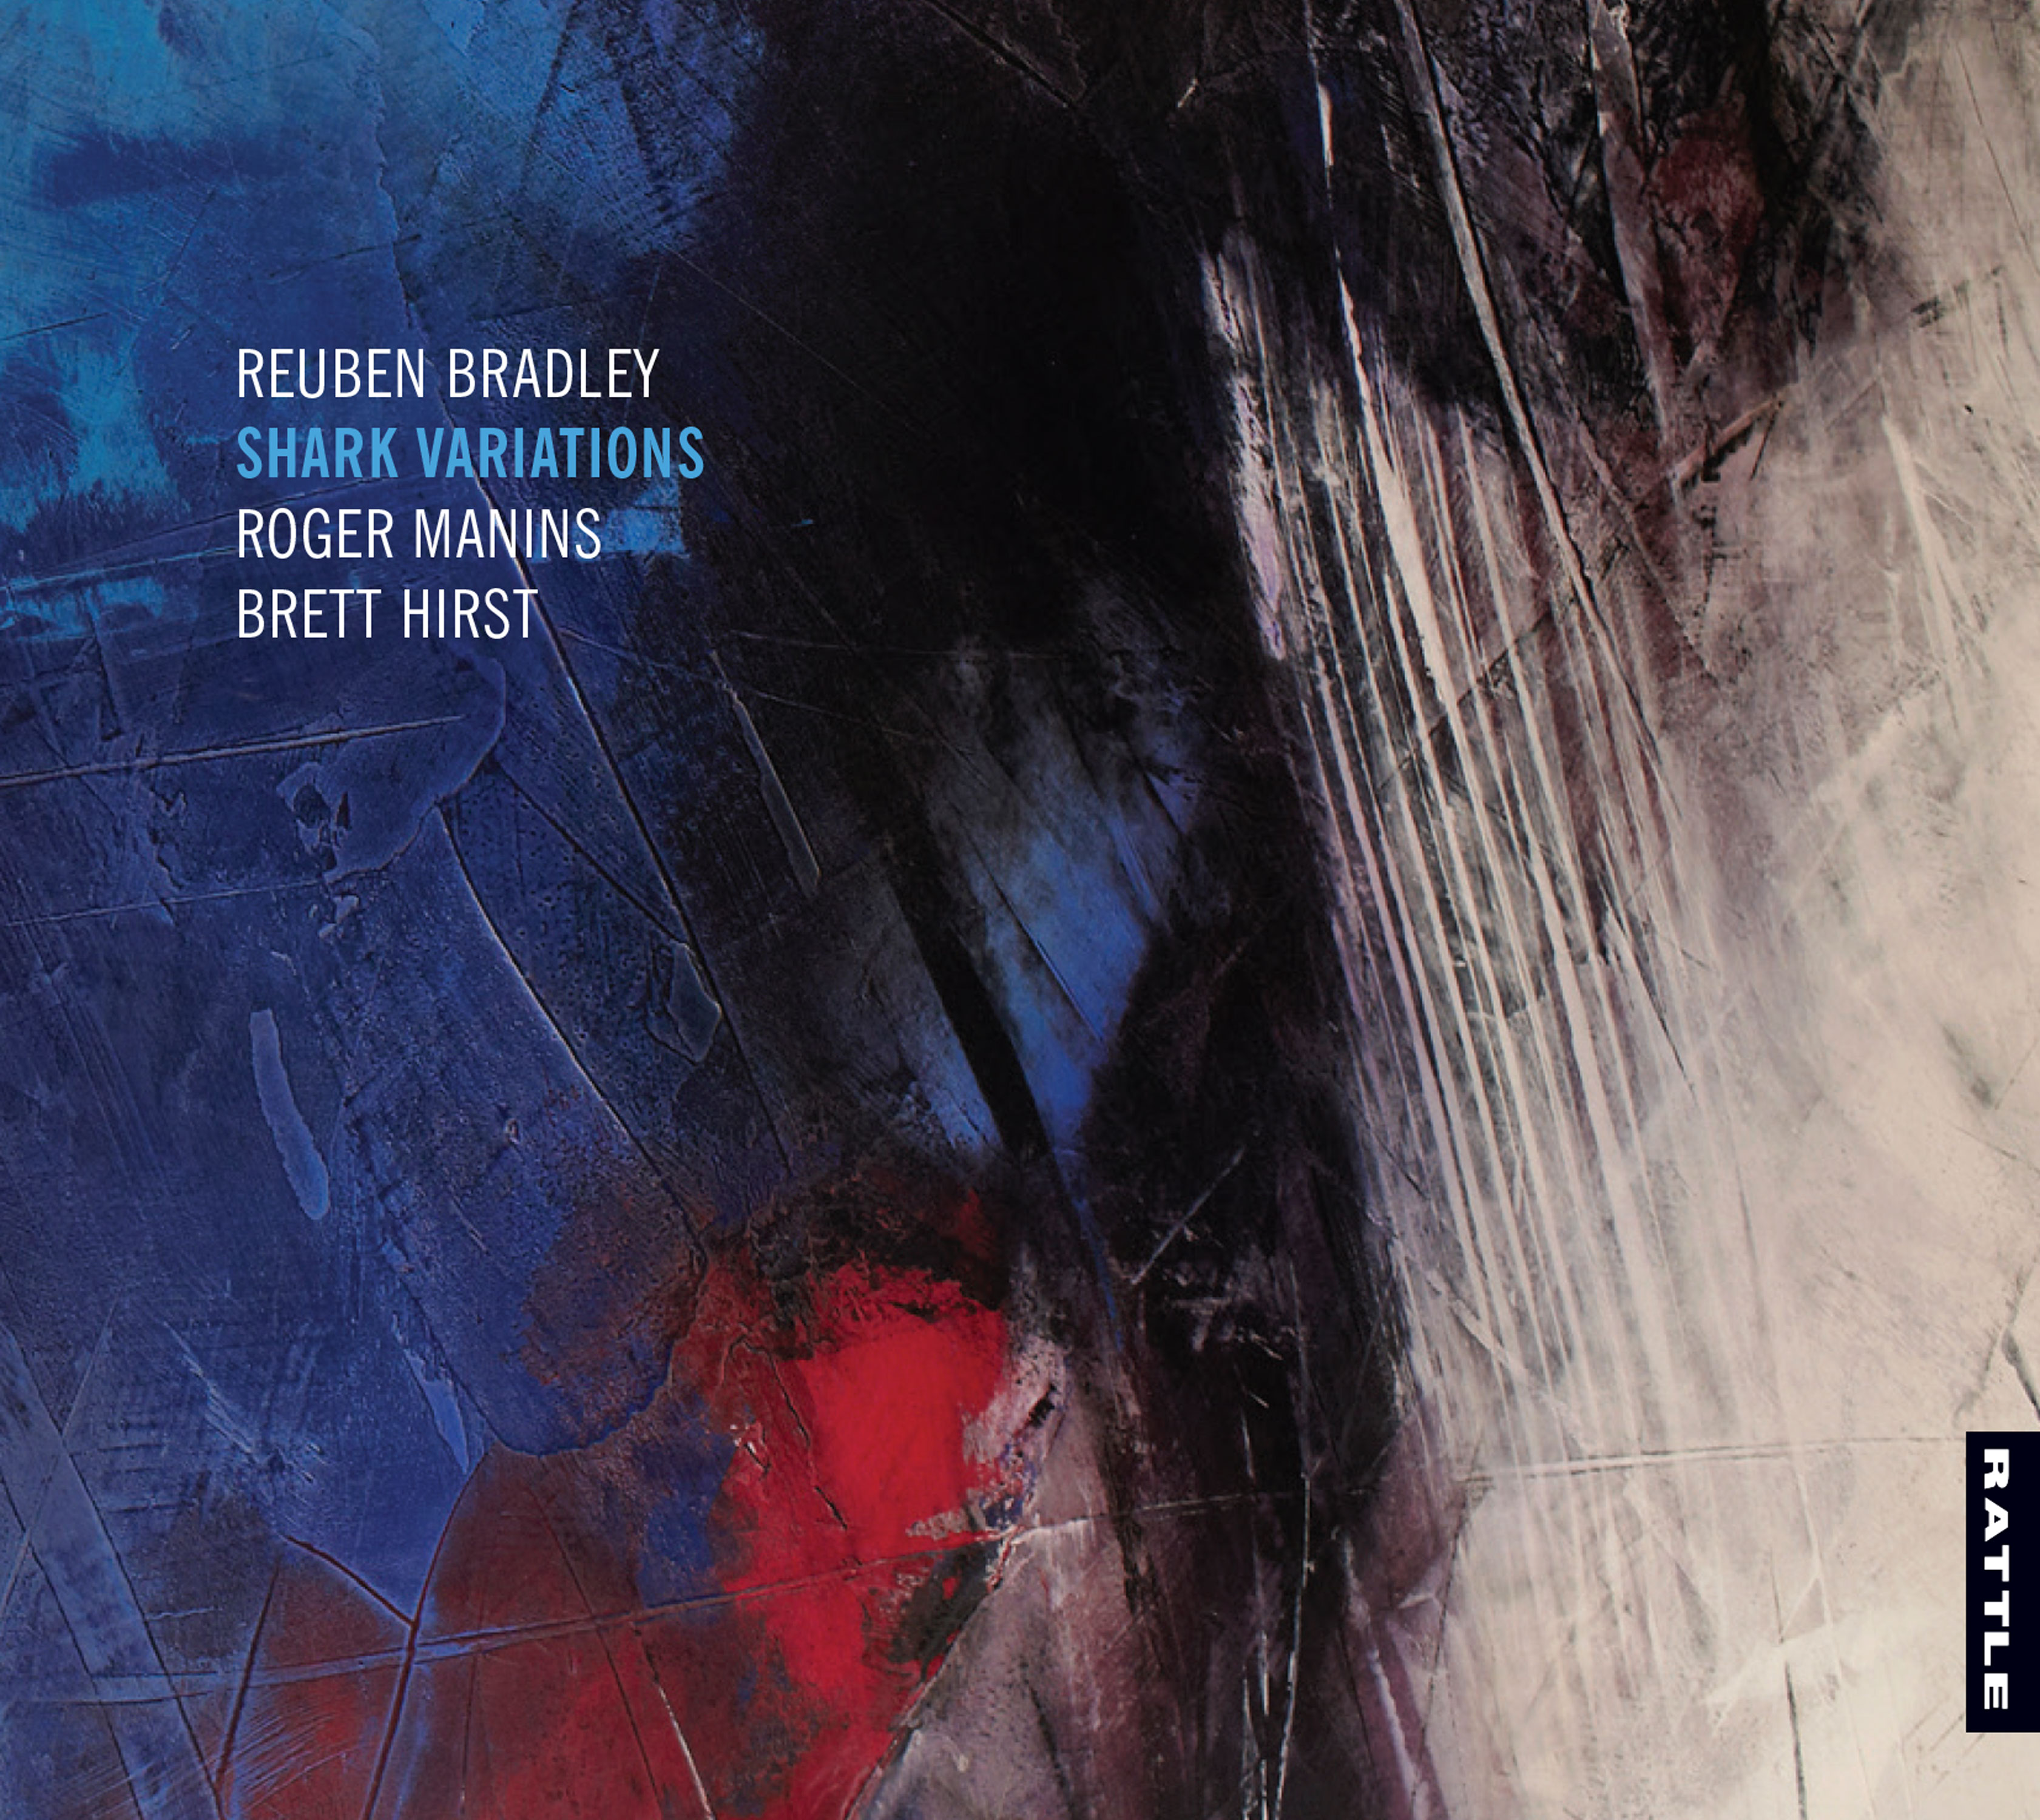 Shark Variations | Reuben Bradley, Roger Manins, Brett Hirst - downloadable MP3 ALBUM